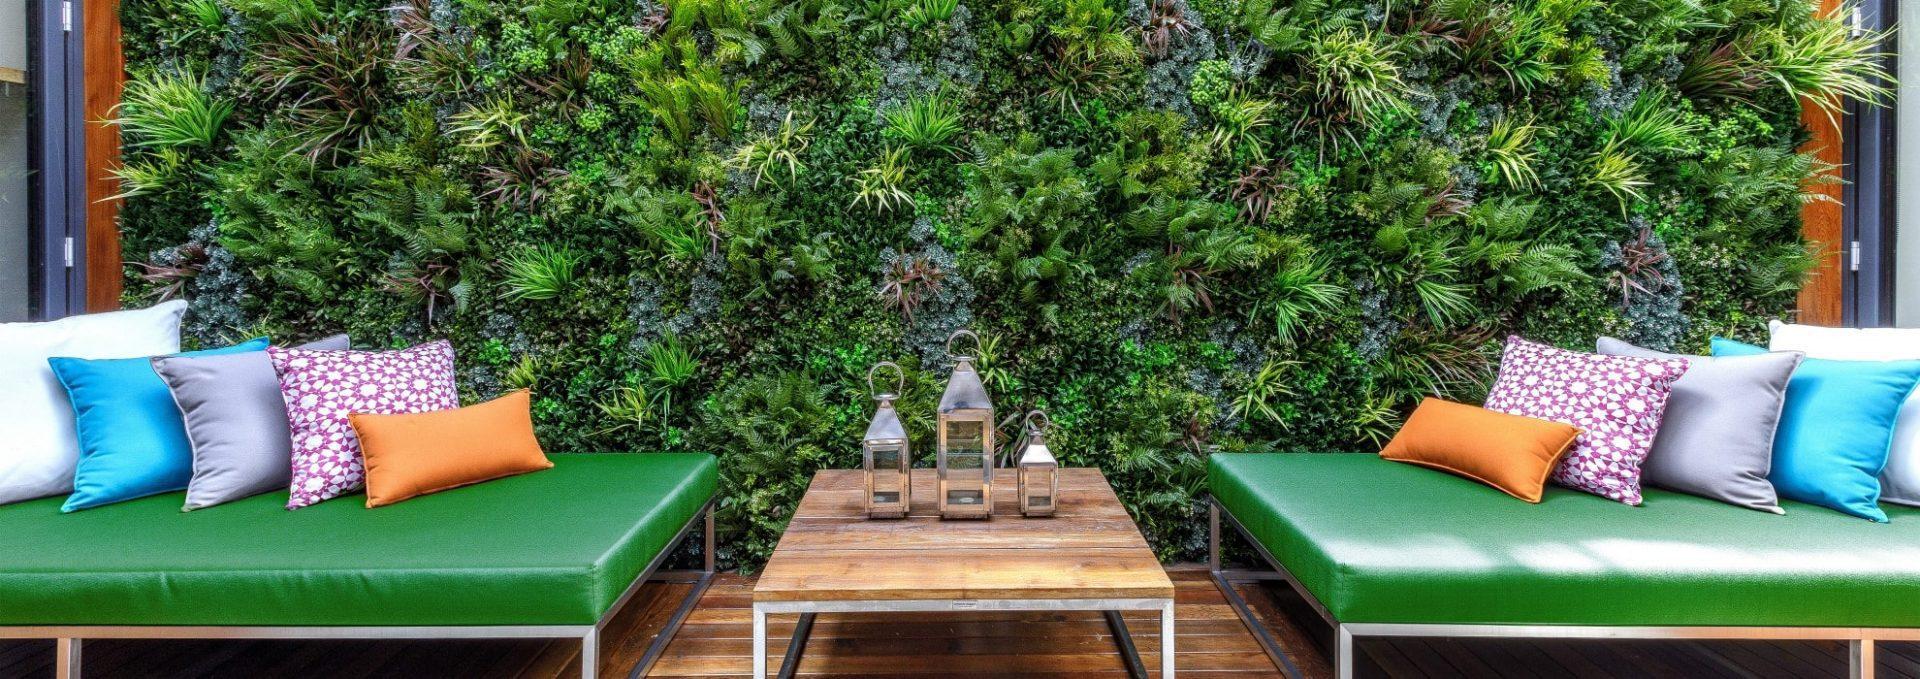 Vertical Garden London